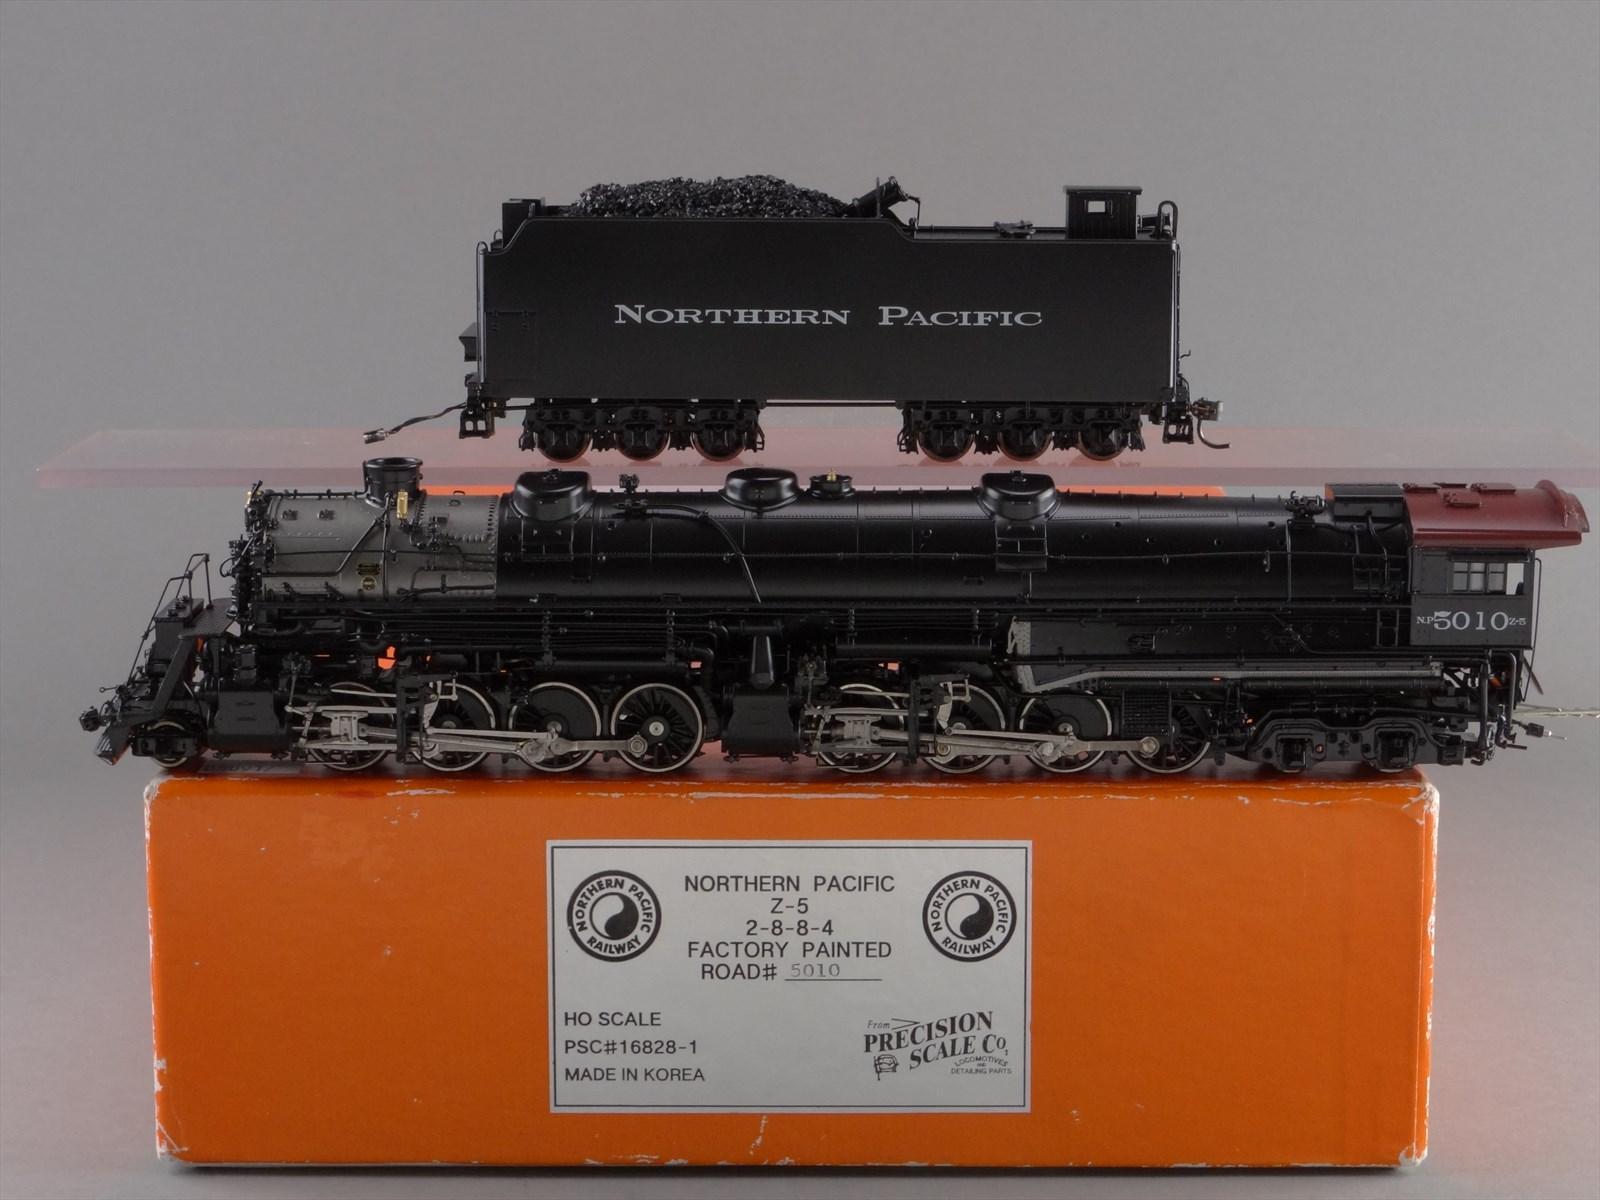 PSC 16828-1 - NP Z-5 - Northern Pacific, 2-8-8-4, Yellowstone No.5010 - Black Boiler.10 BOX